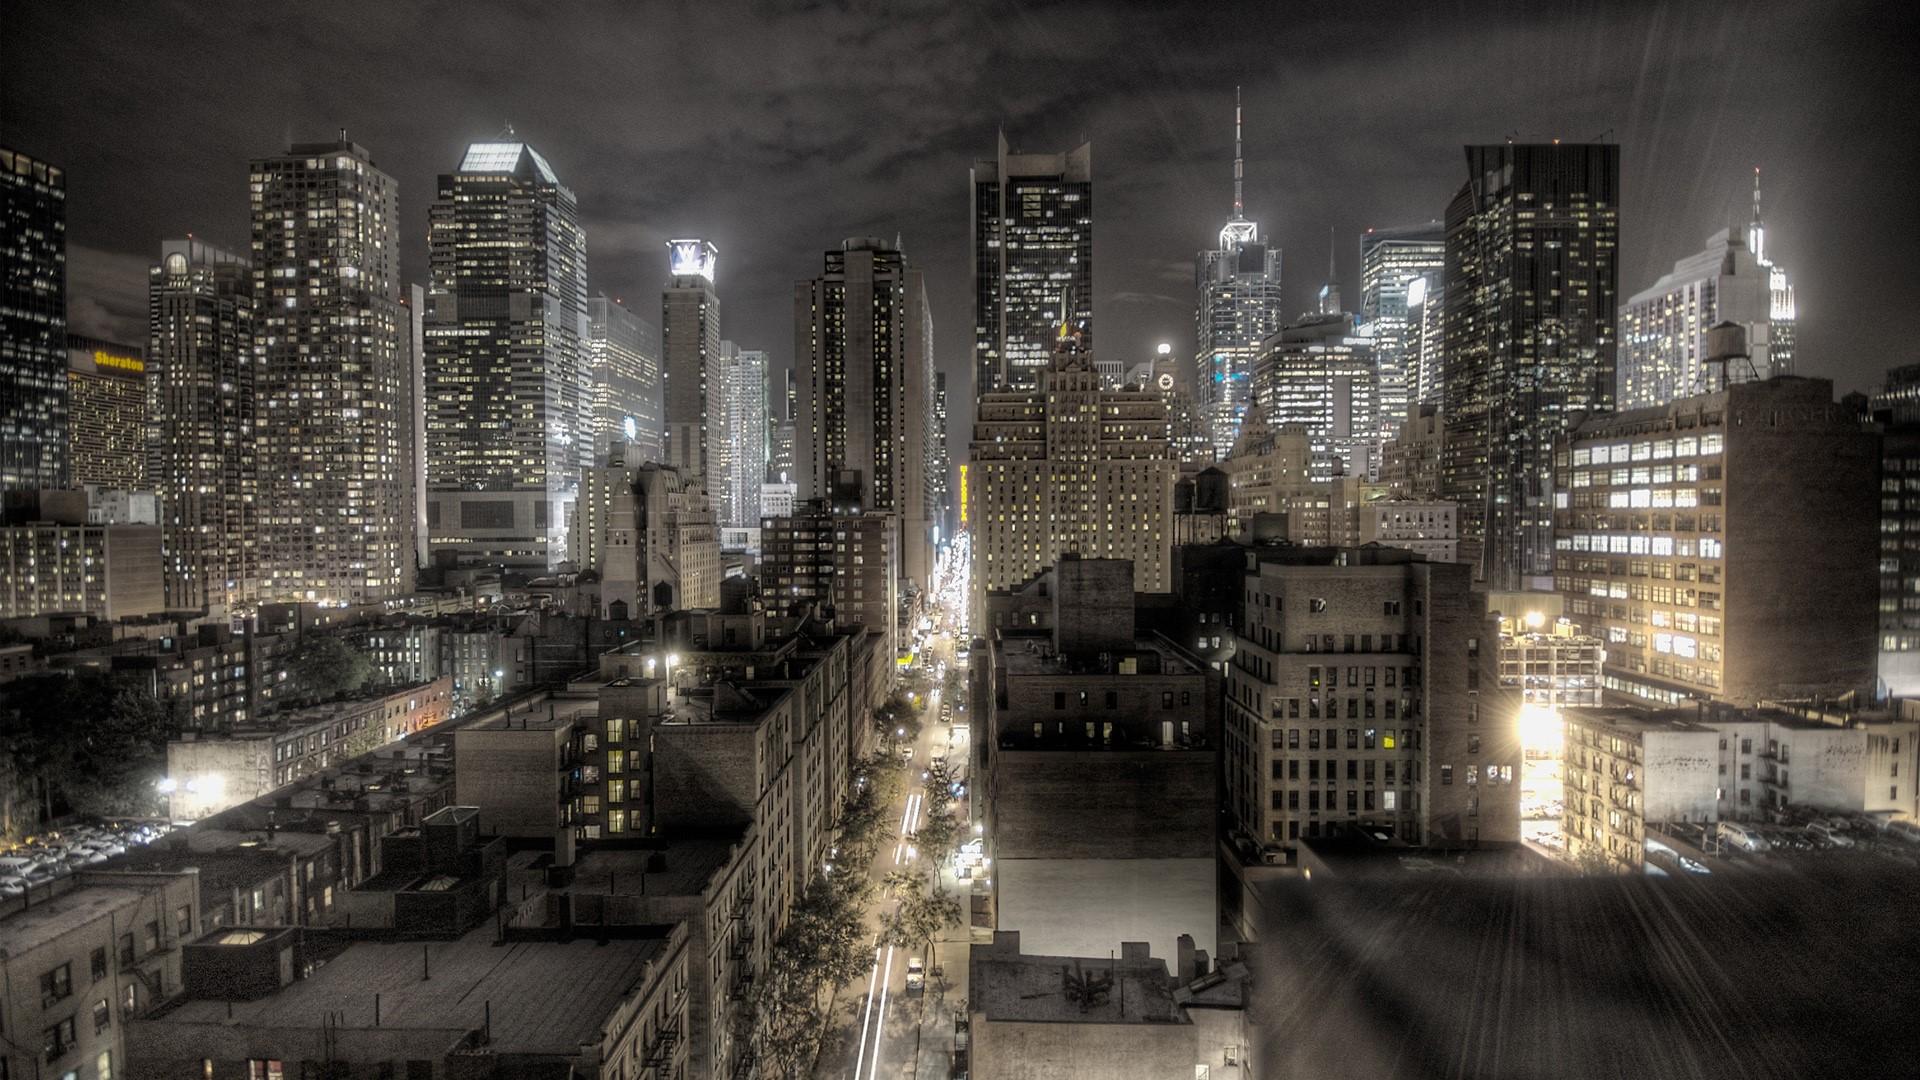 City 15